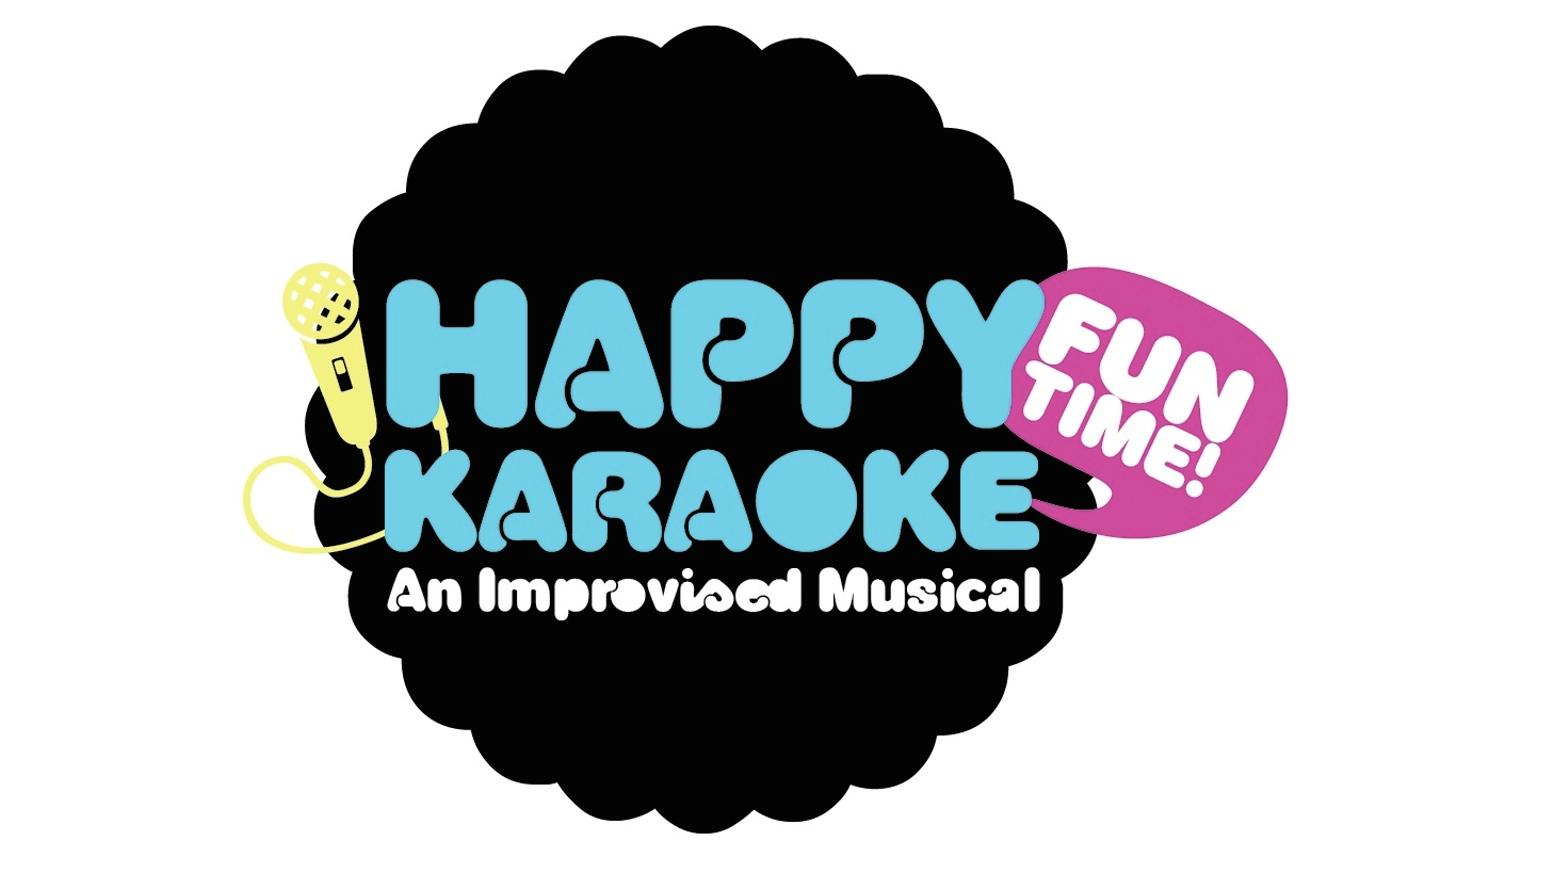 Happy Karaoke Fun Time Goes Off.